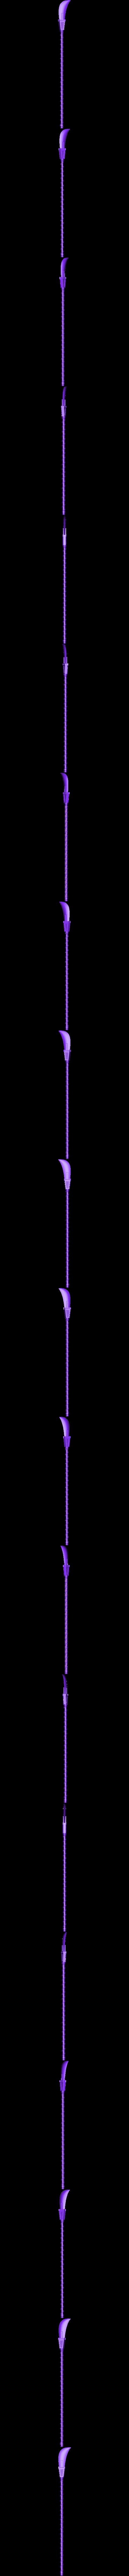 spear2700long.stl Download STL file Bisento Spear of white beard One Piece 3D print model • 3D printable design, MLBdesign